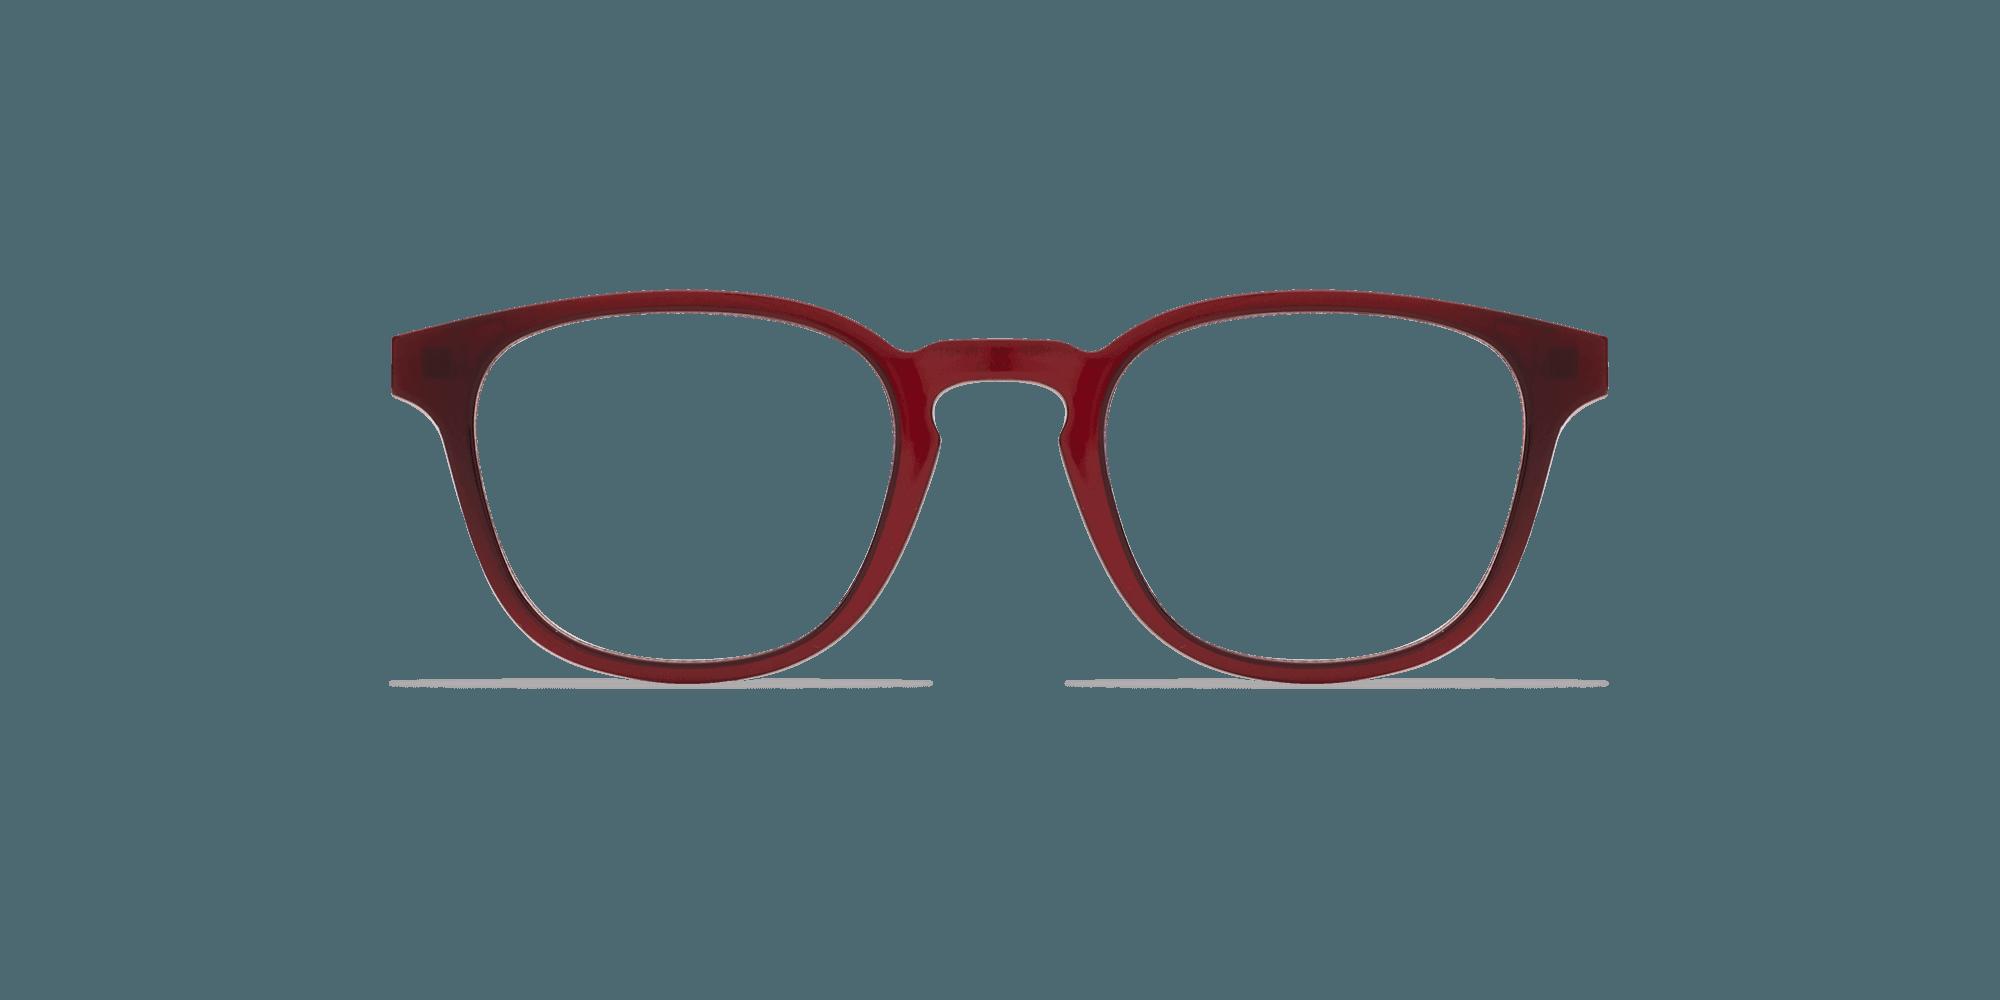 afflelou/france/products/smart_clip/clips_glasses/07630036429228_face.png